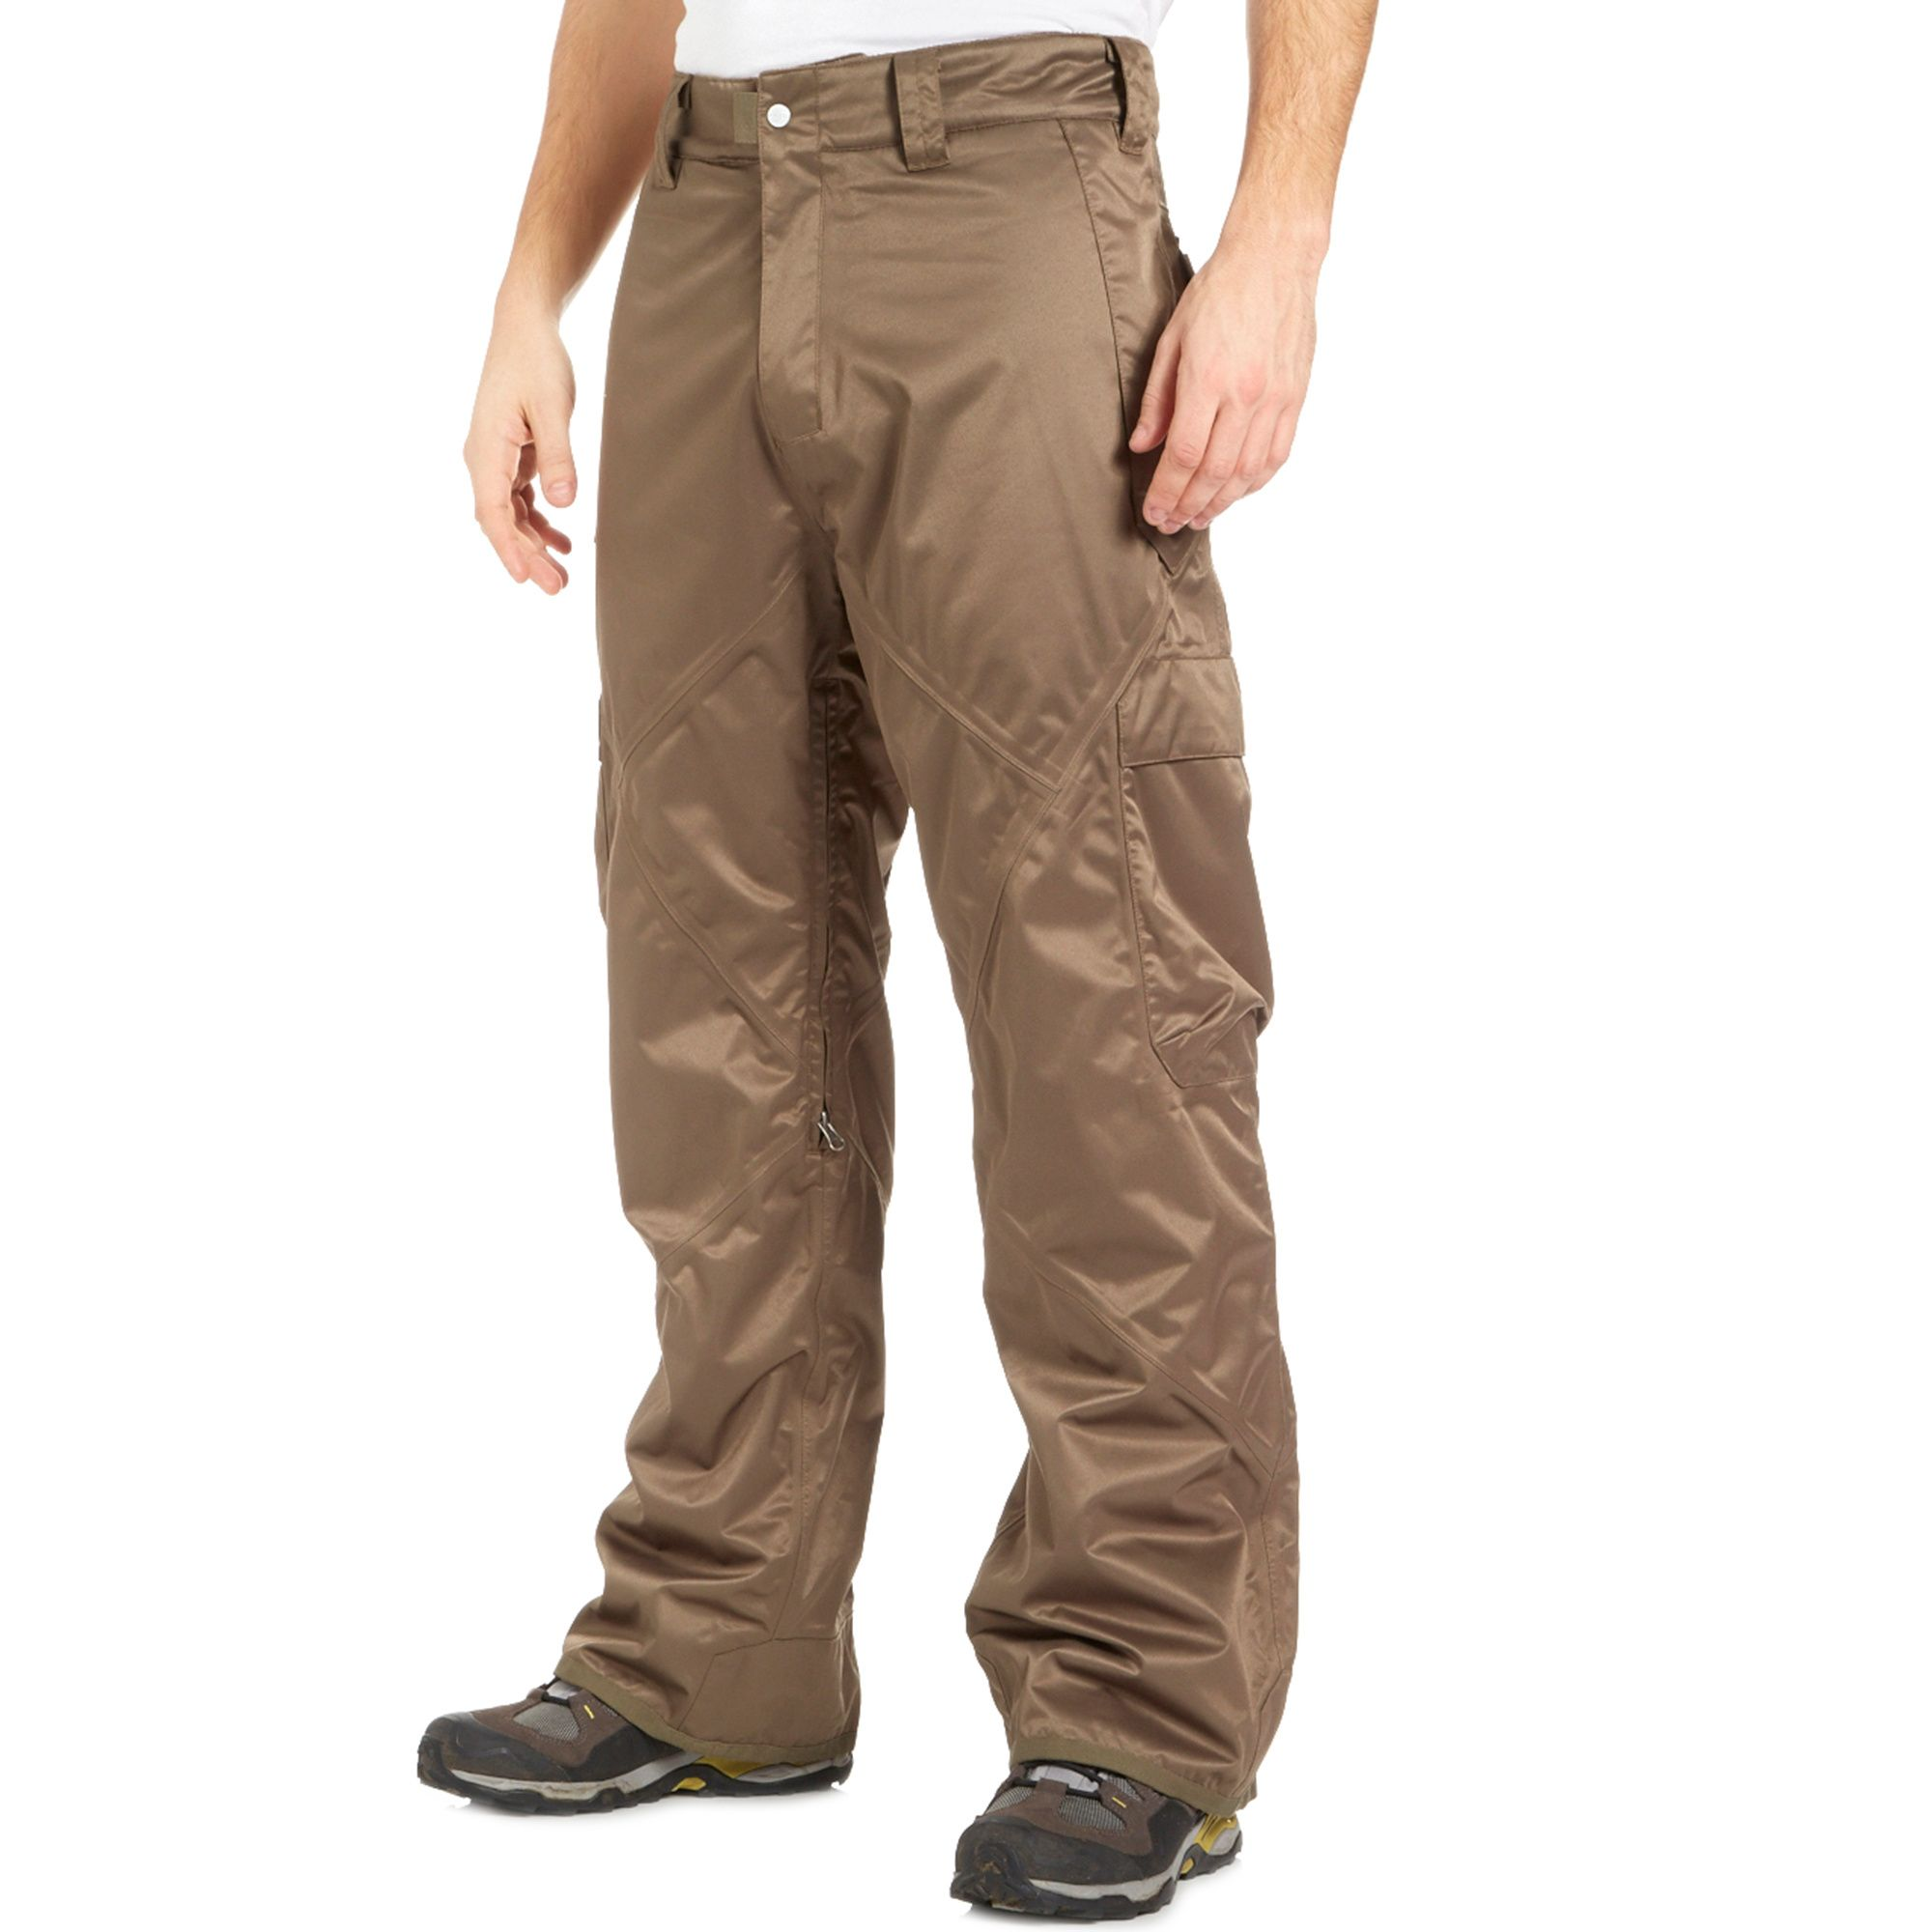 FAIISE Men's Alex Belted Ski Pants